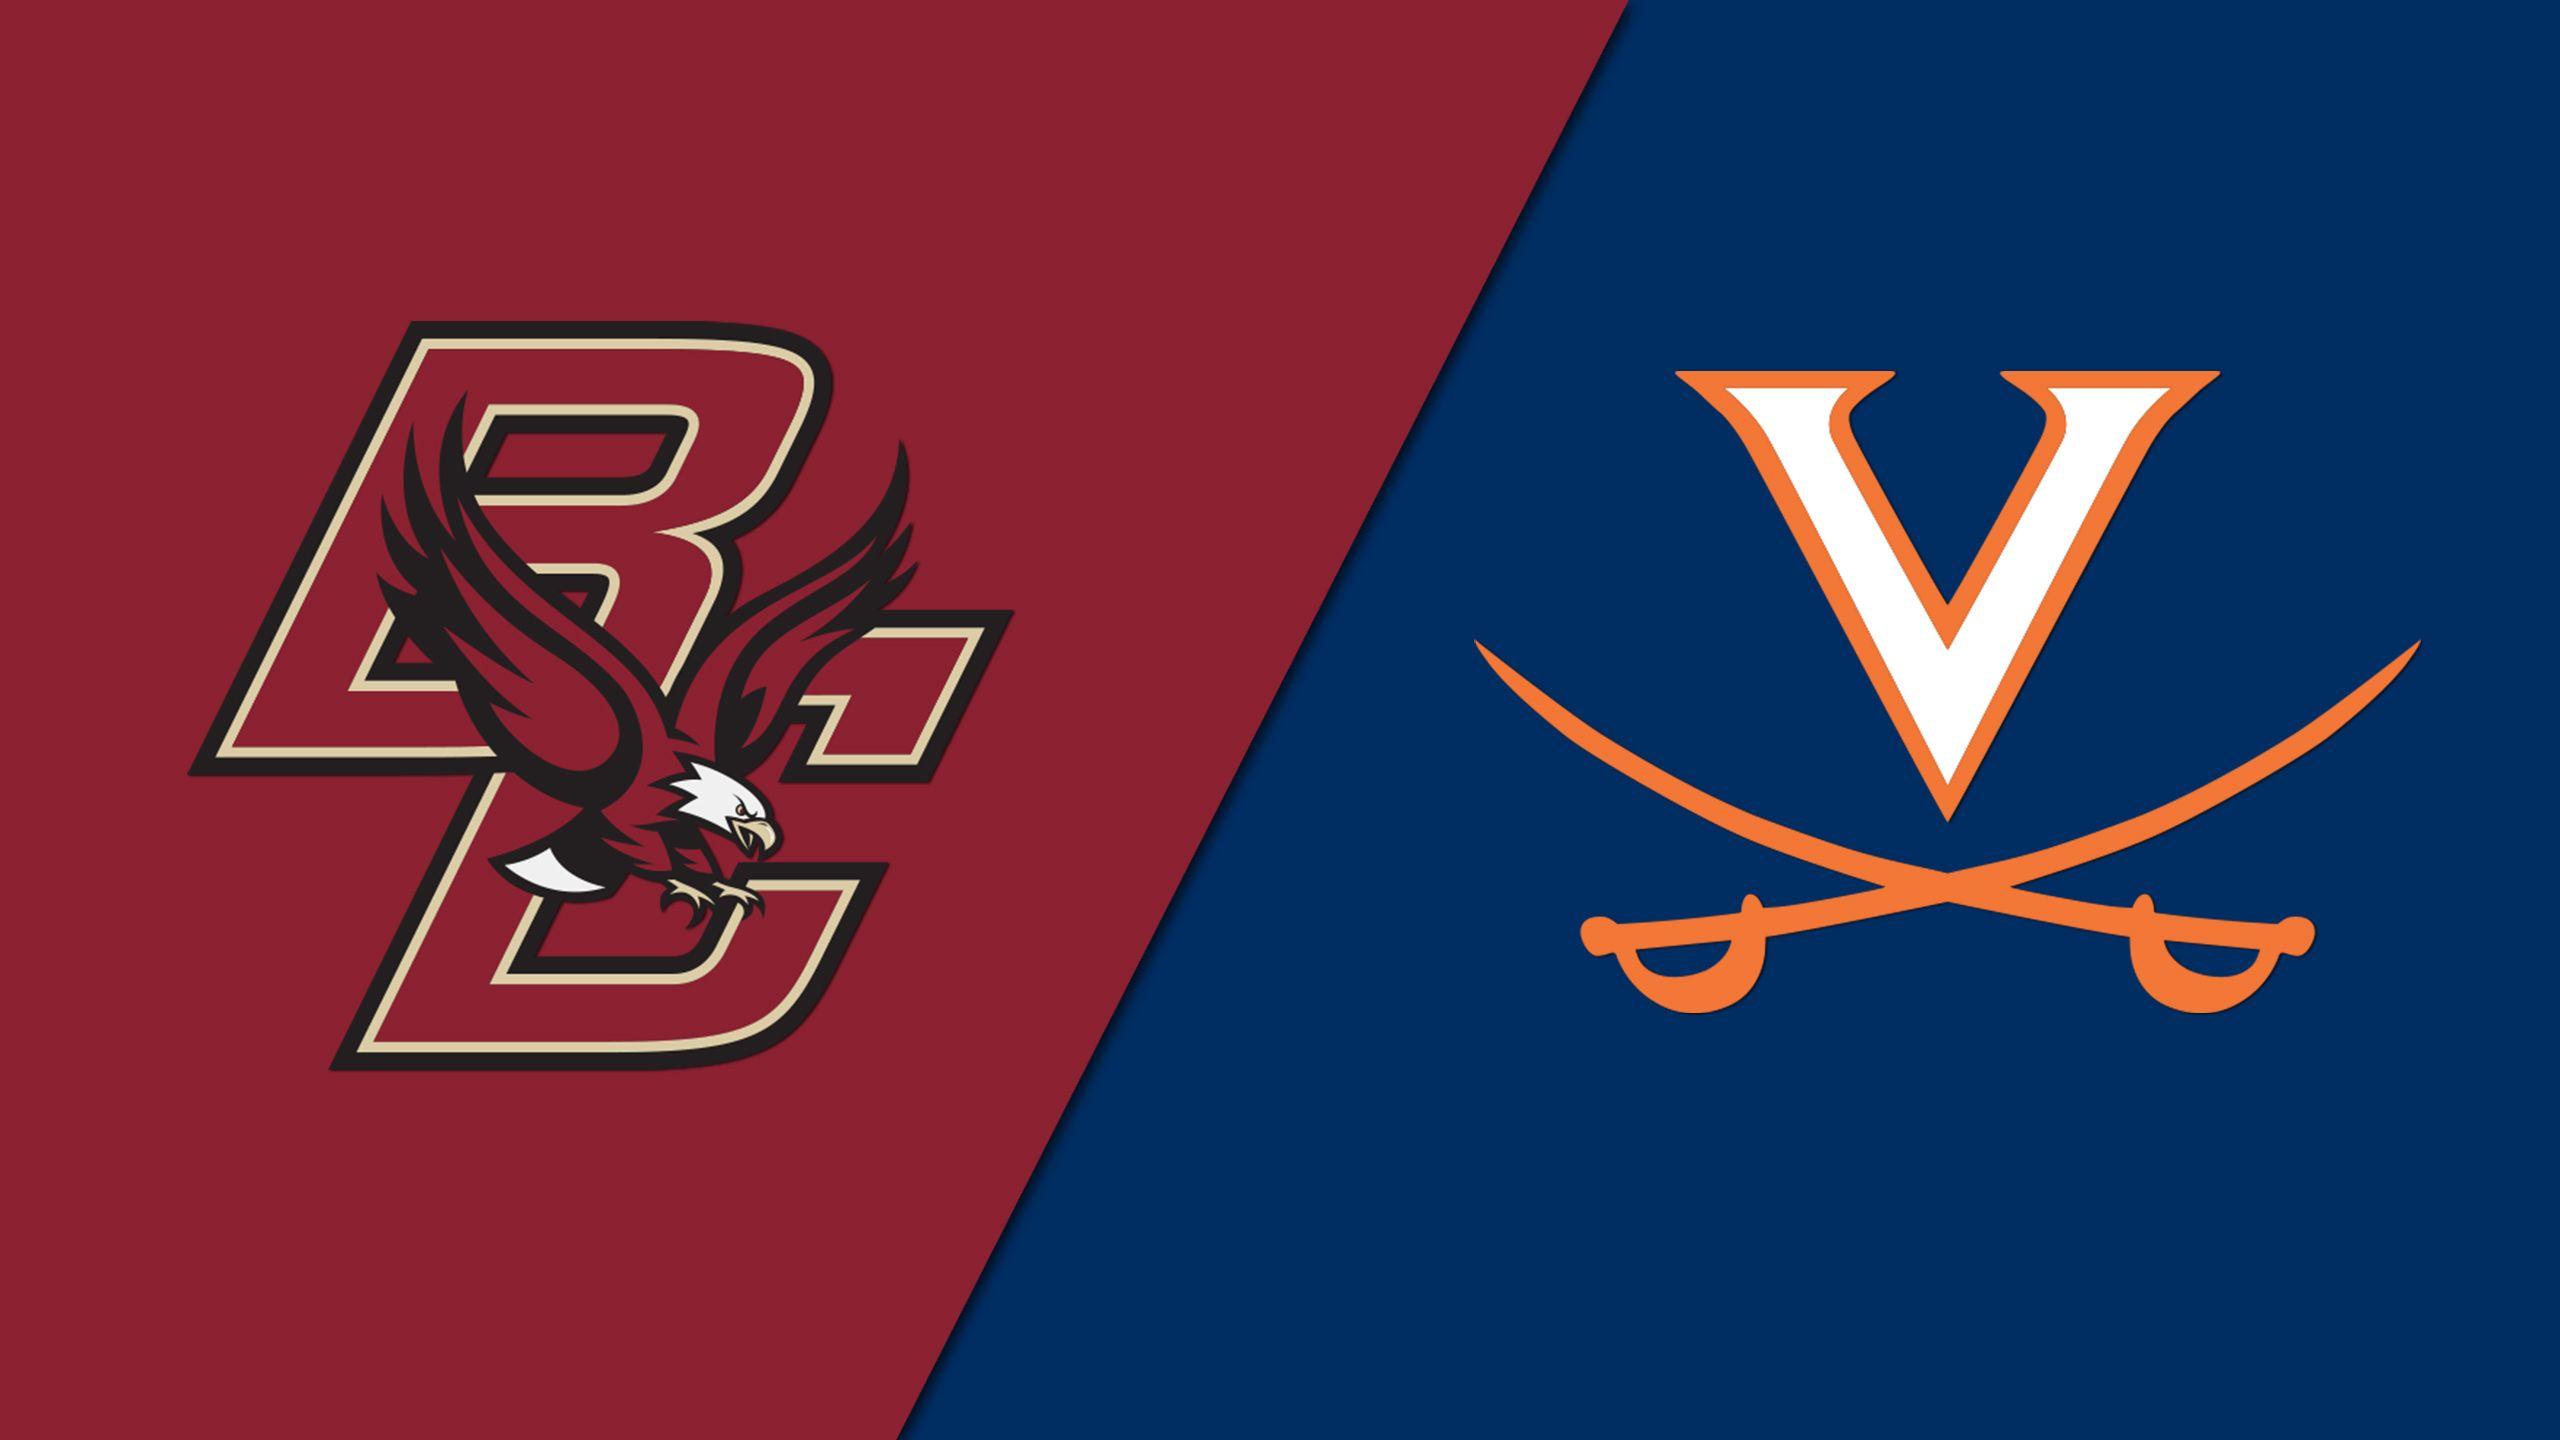 Boston College vs. #21 Virginia (Baseball)